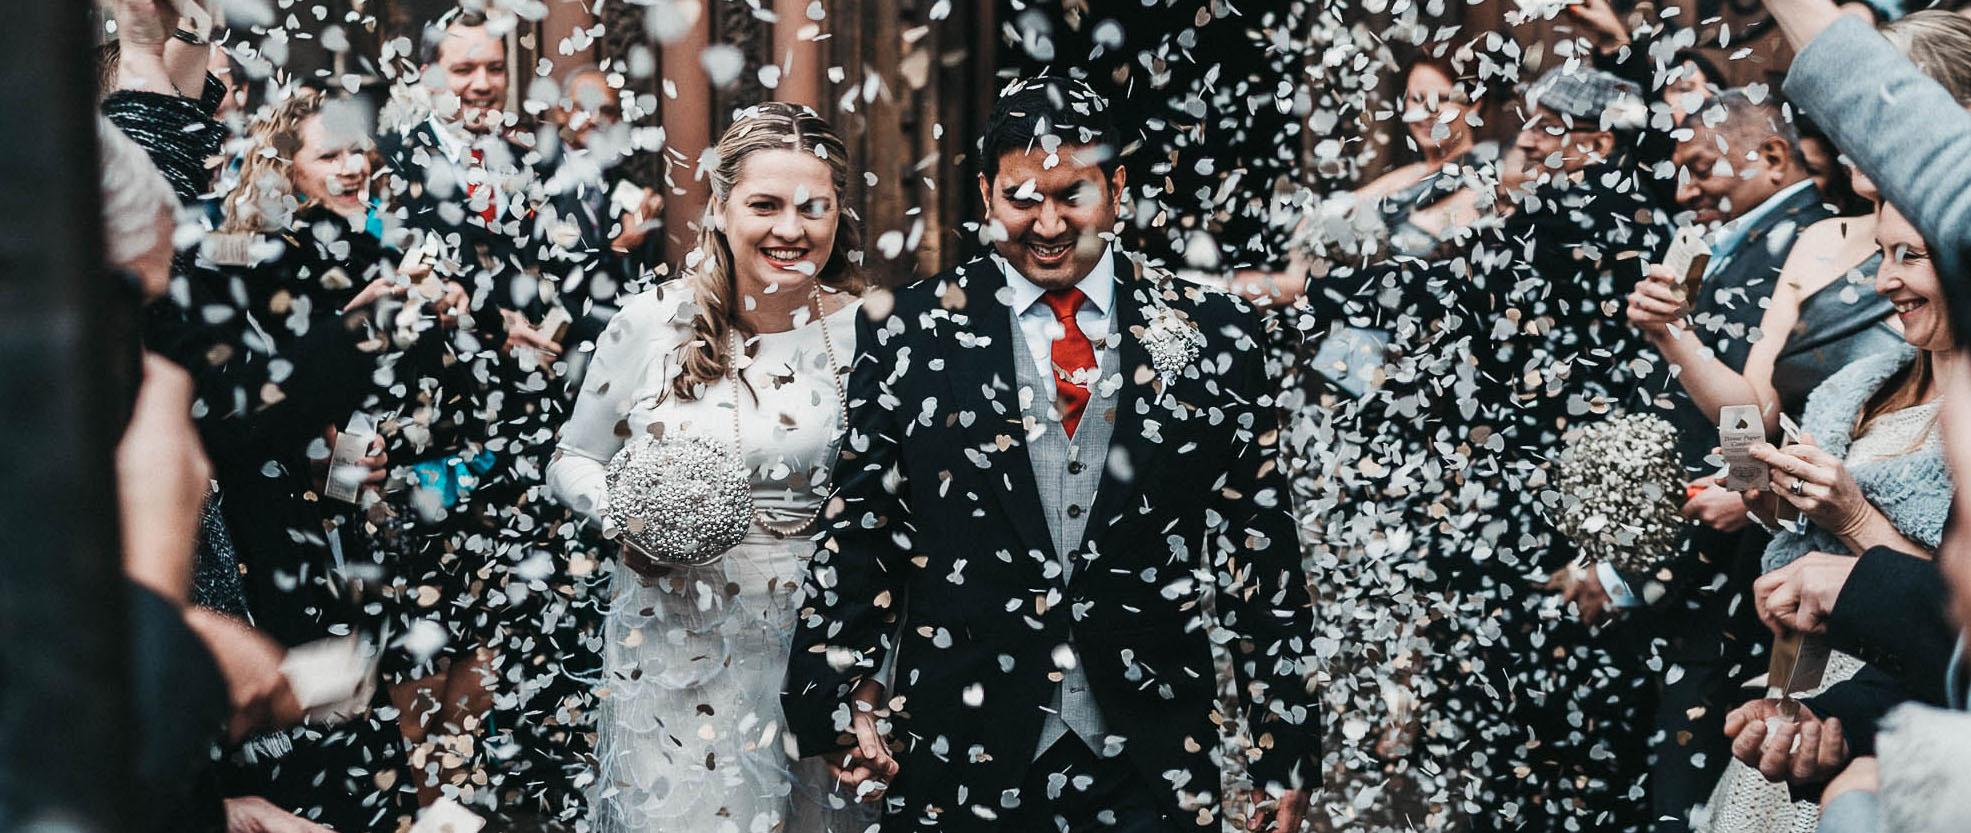 Winter-Wedding-Offer-103.jpg